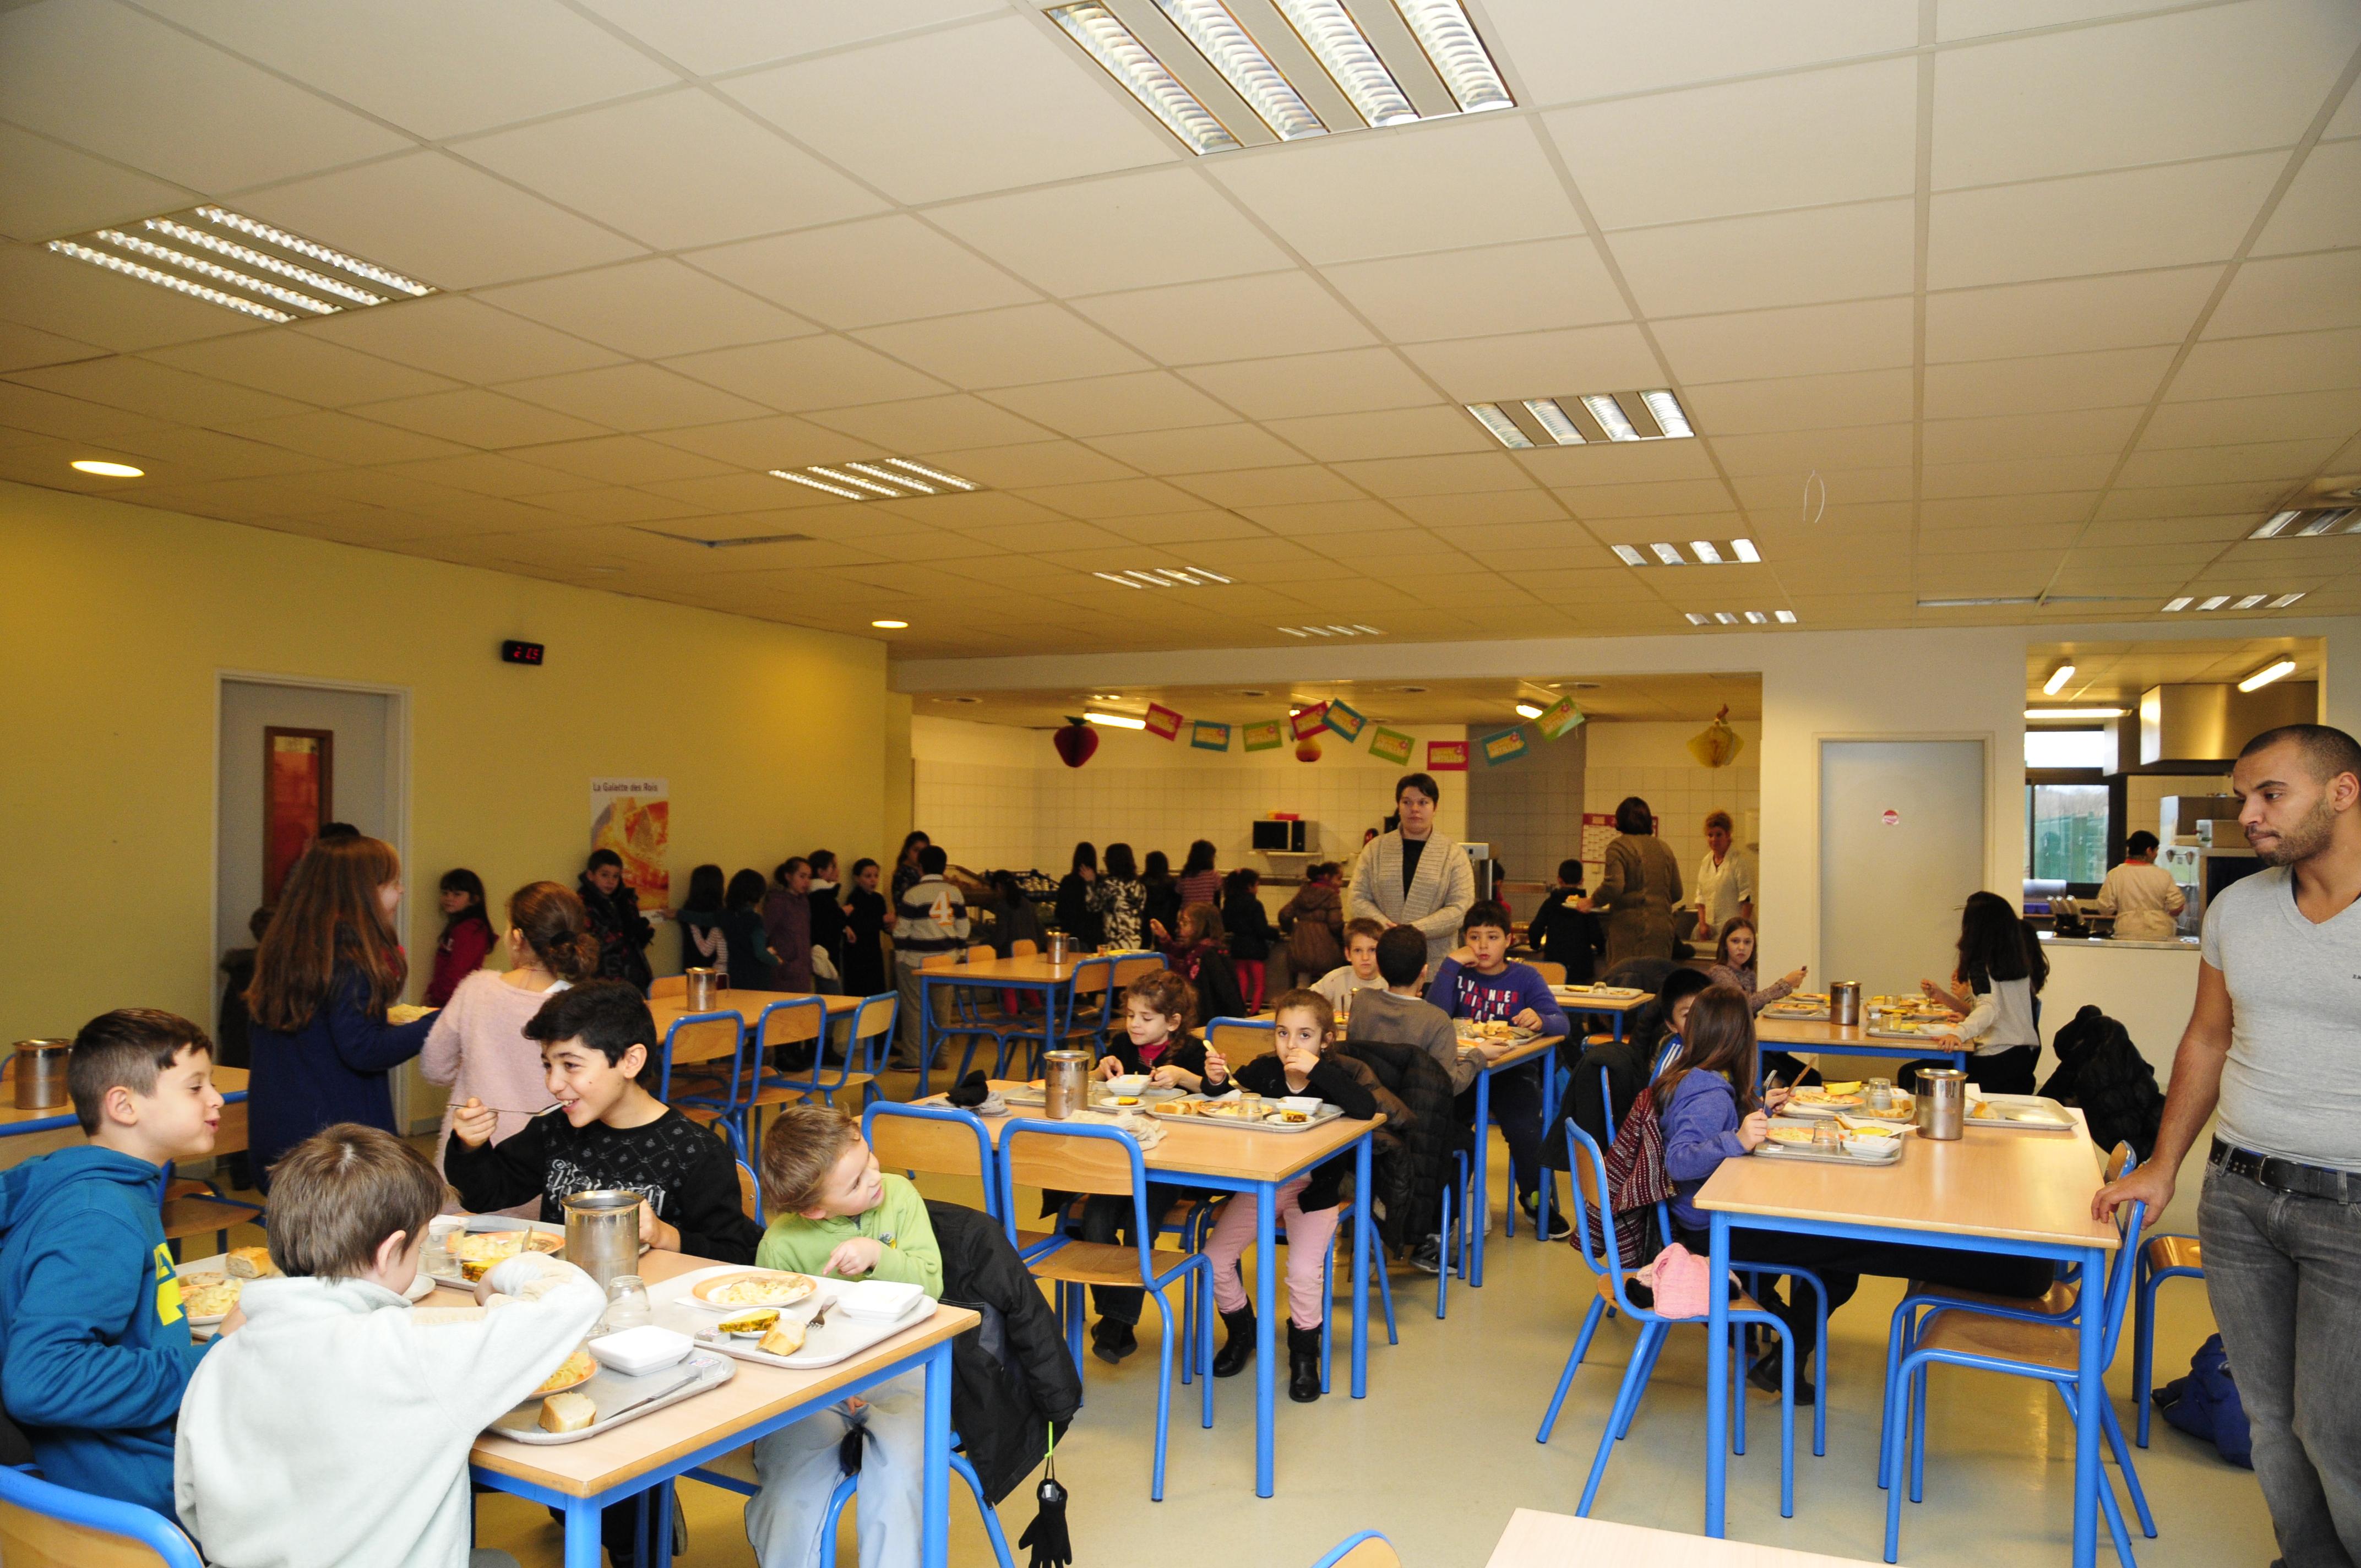 Emploi agent service cantine scolaire for Emploi cuisinier cantine scolaire